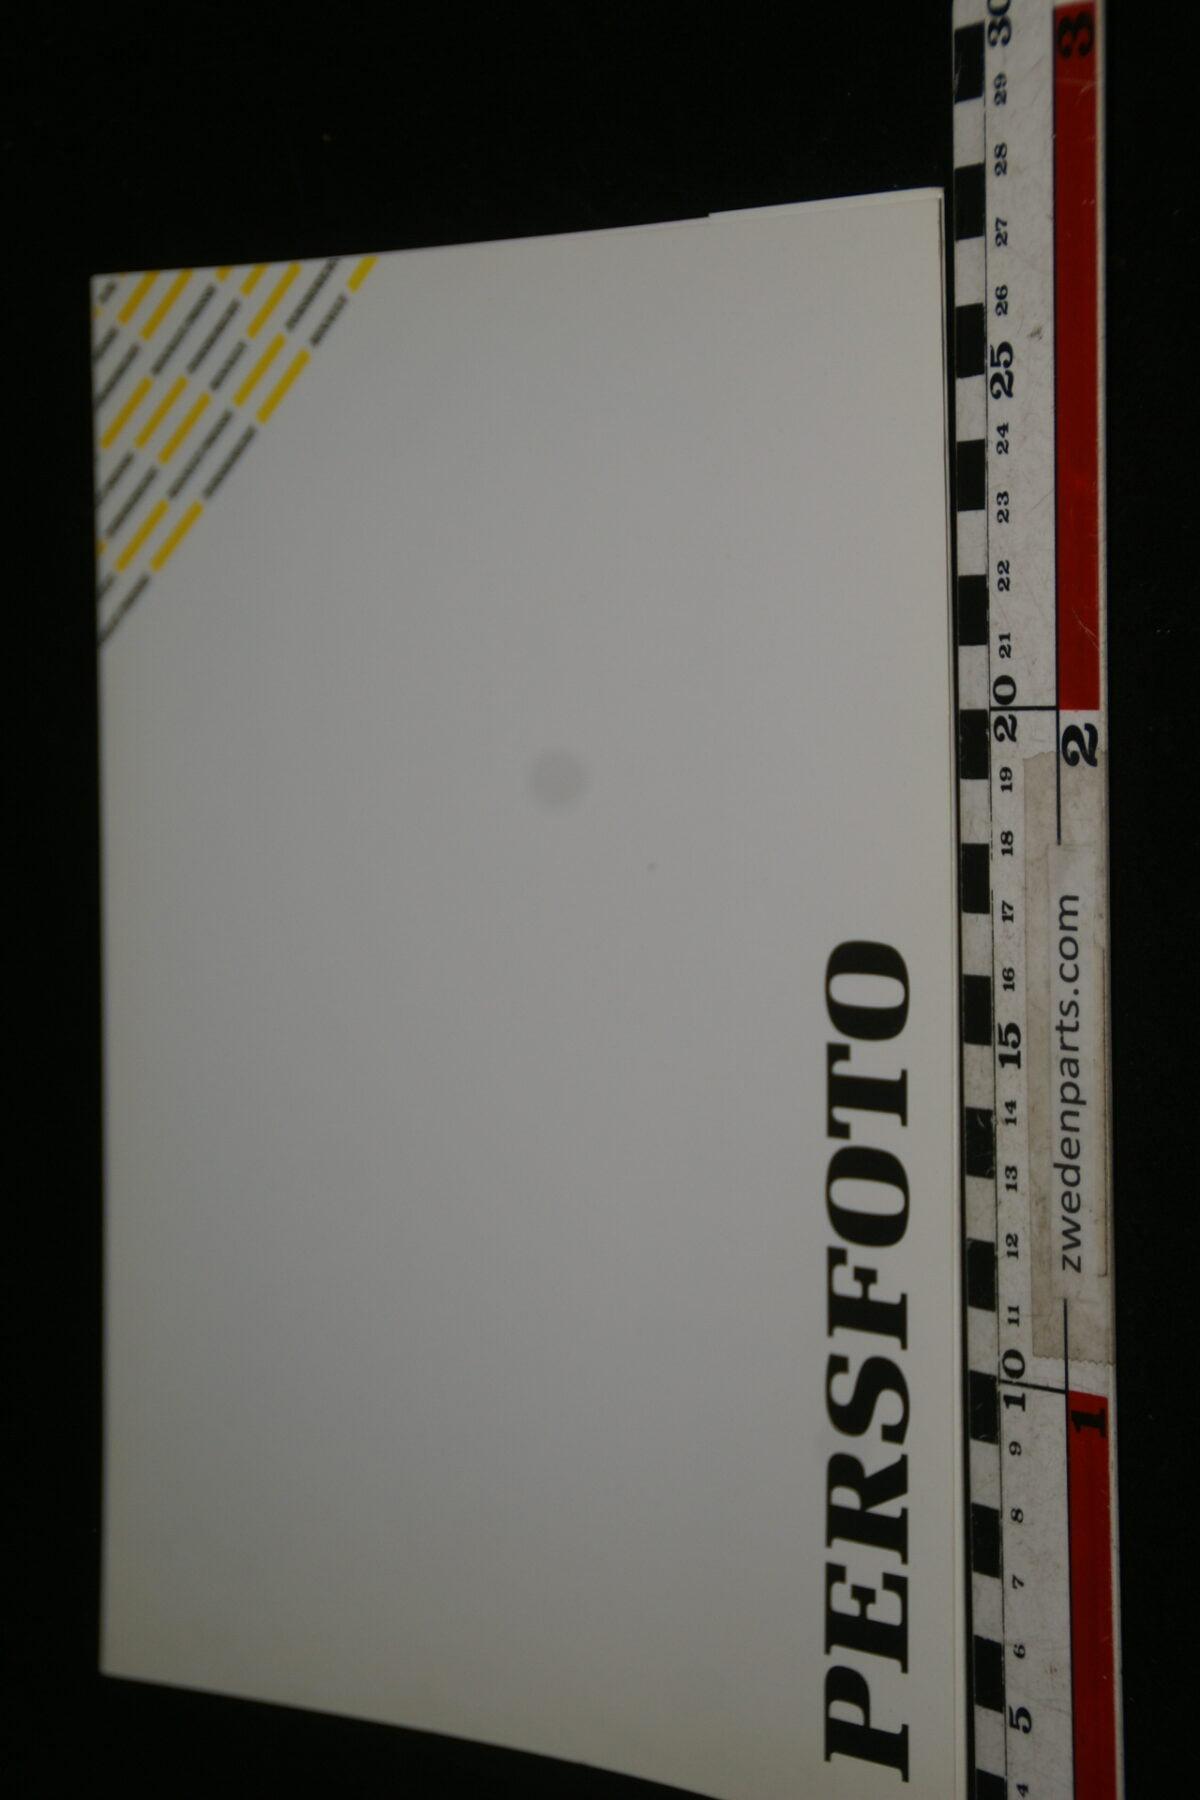 DSC09980 1991 originele persbericht Renault Milieuzorg-8bf7fd1c